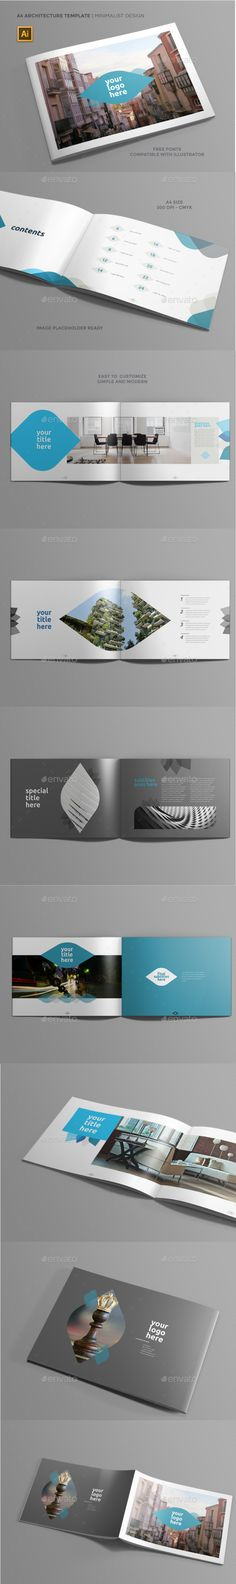 A4 Architecture Brochure   Minimalist Design - Brochures Print Templates Download here : https://graphicriver.net/item/a4-architecture-brochure-minimalist-design/19437117?s_rank=123&ref=Al-fatih